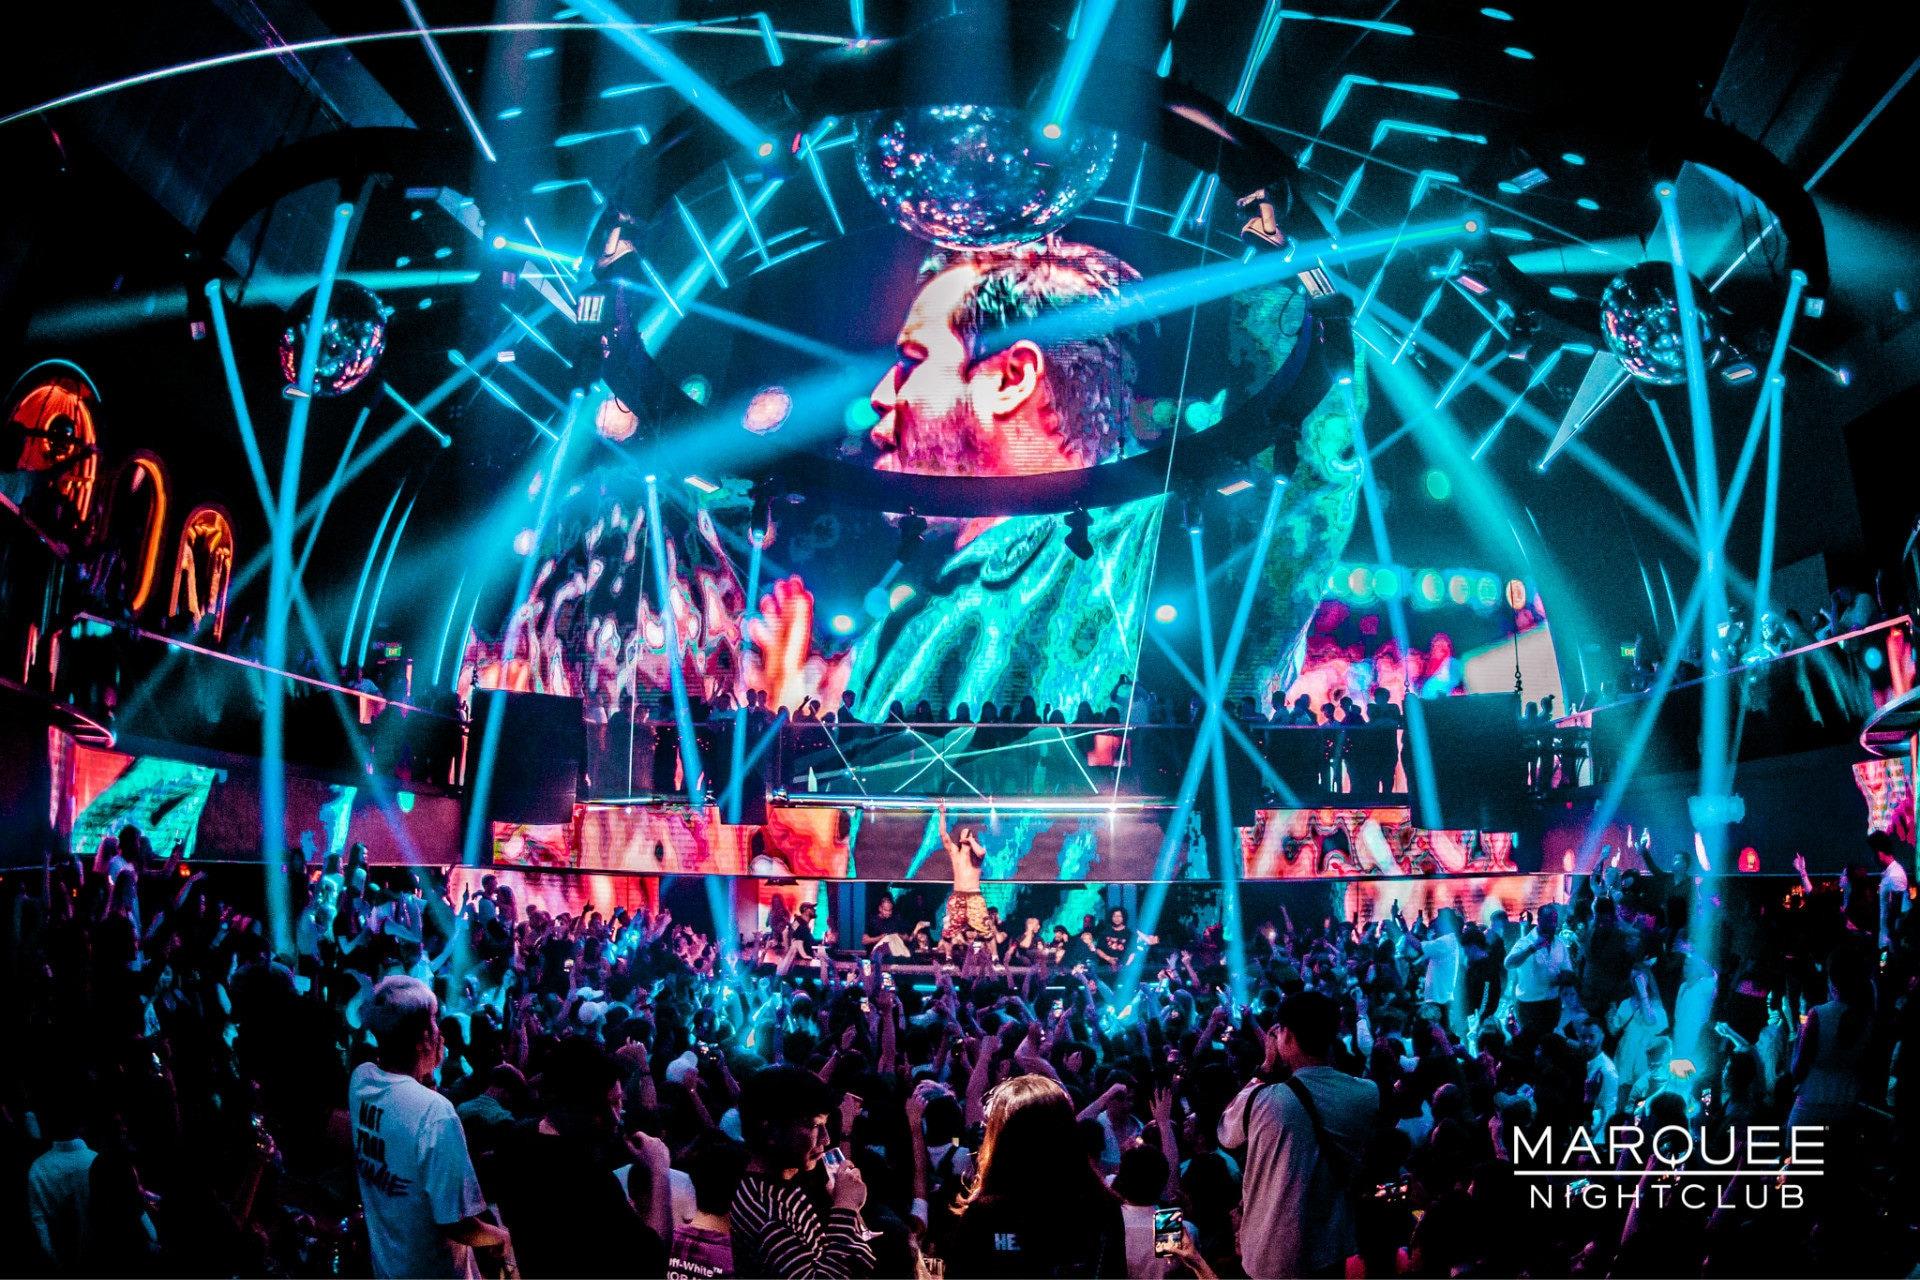 MARQUEE Nightclub Singapore | Nightlife | Marina Bay Sands